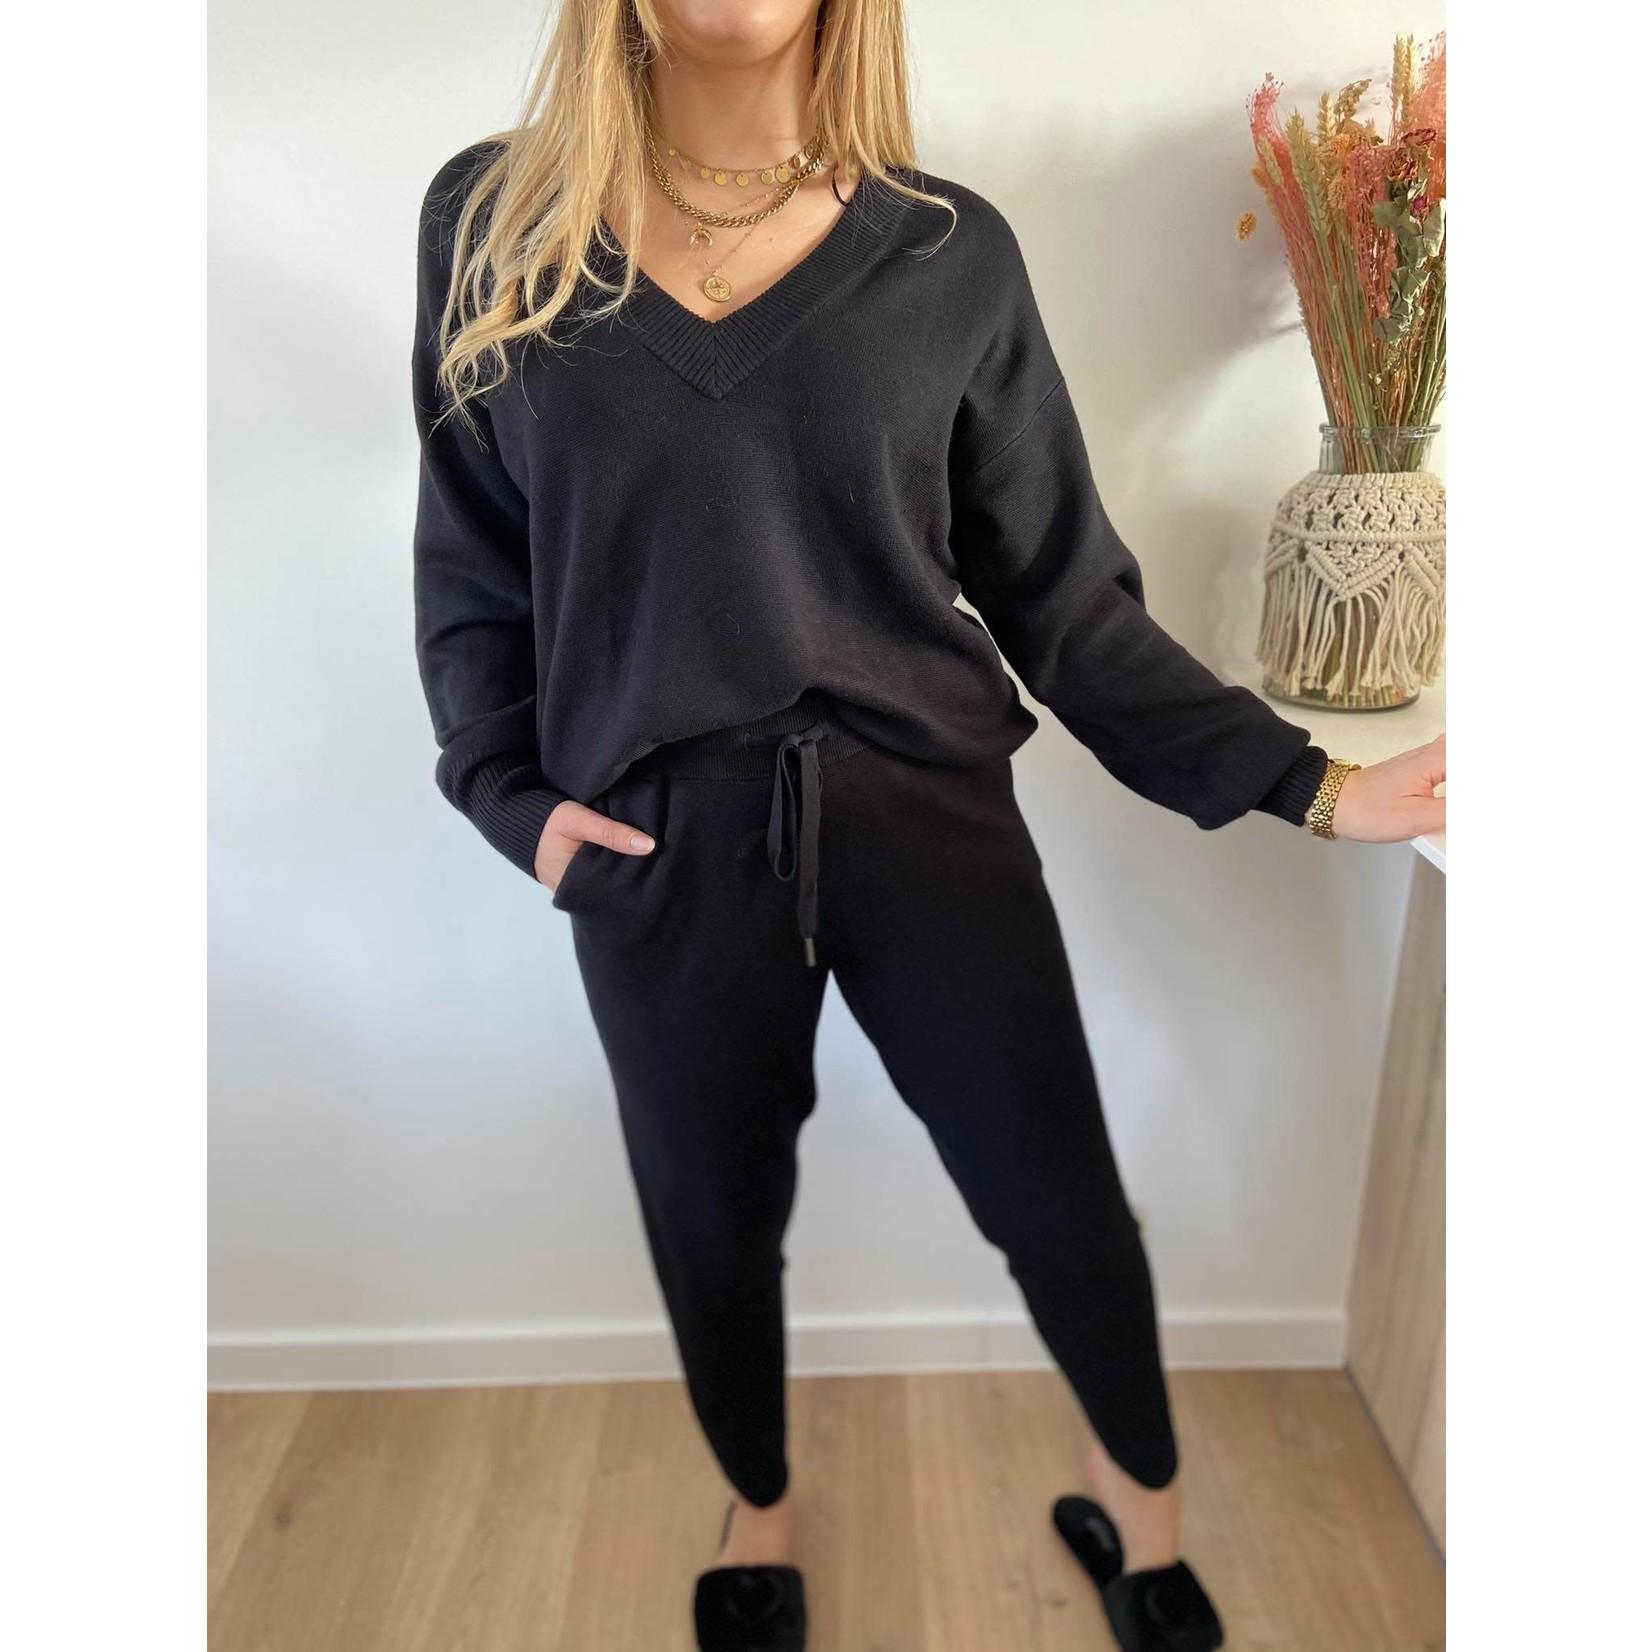 KAkitlyn 7/8 Knit Pants black